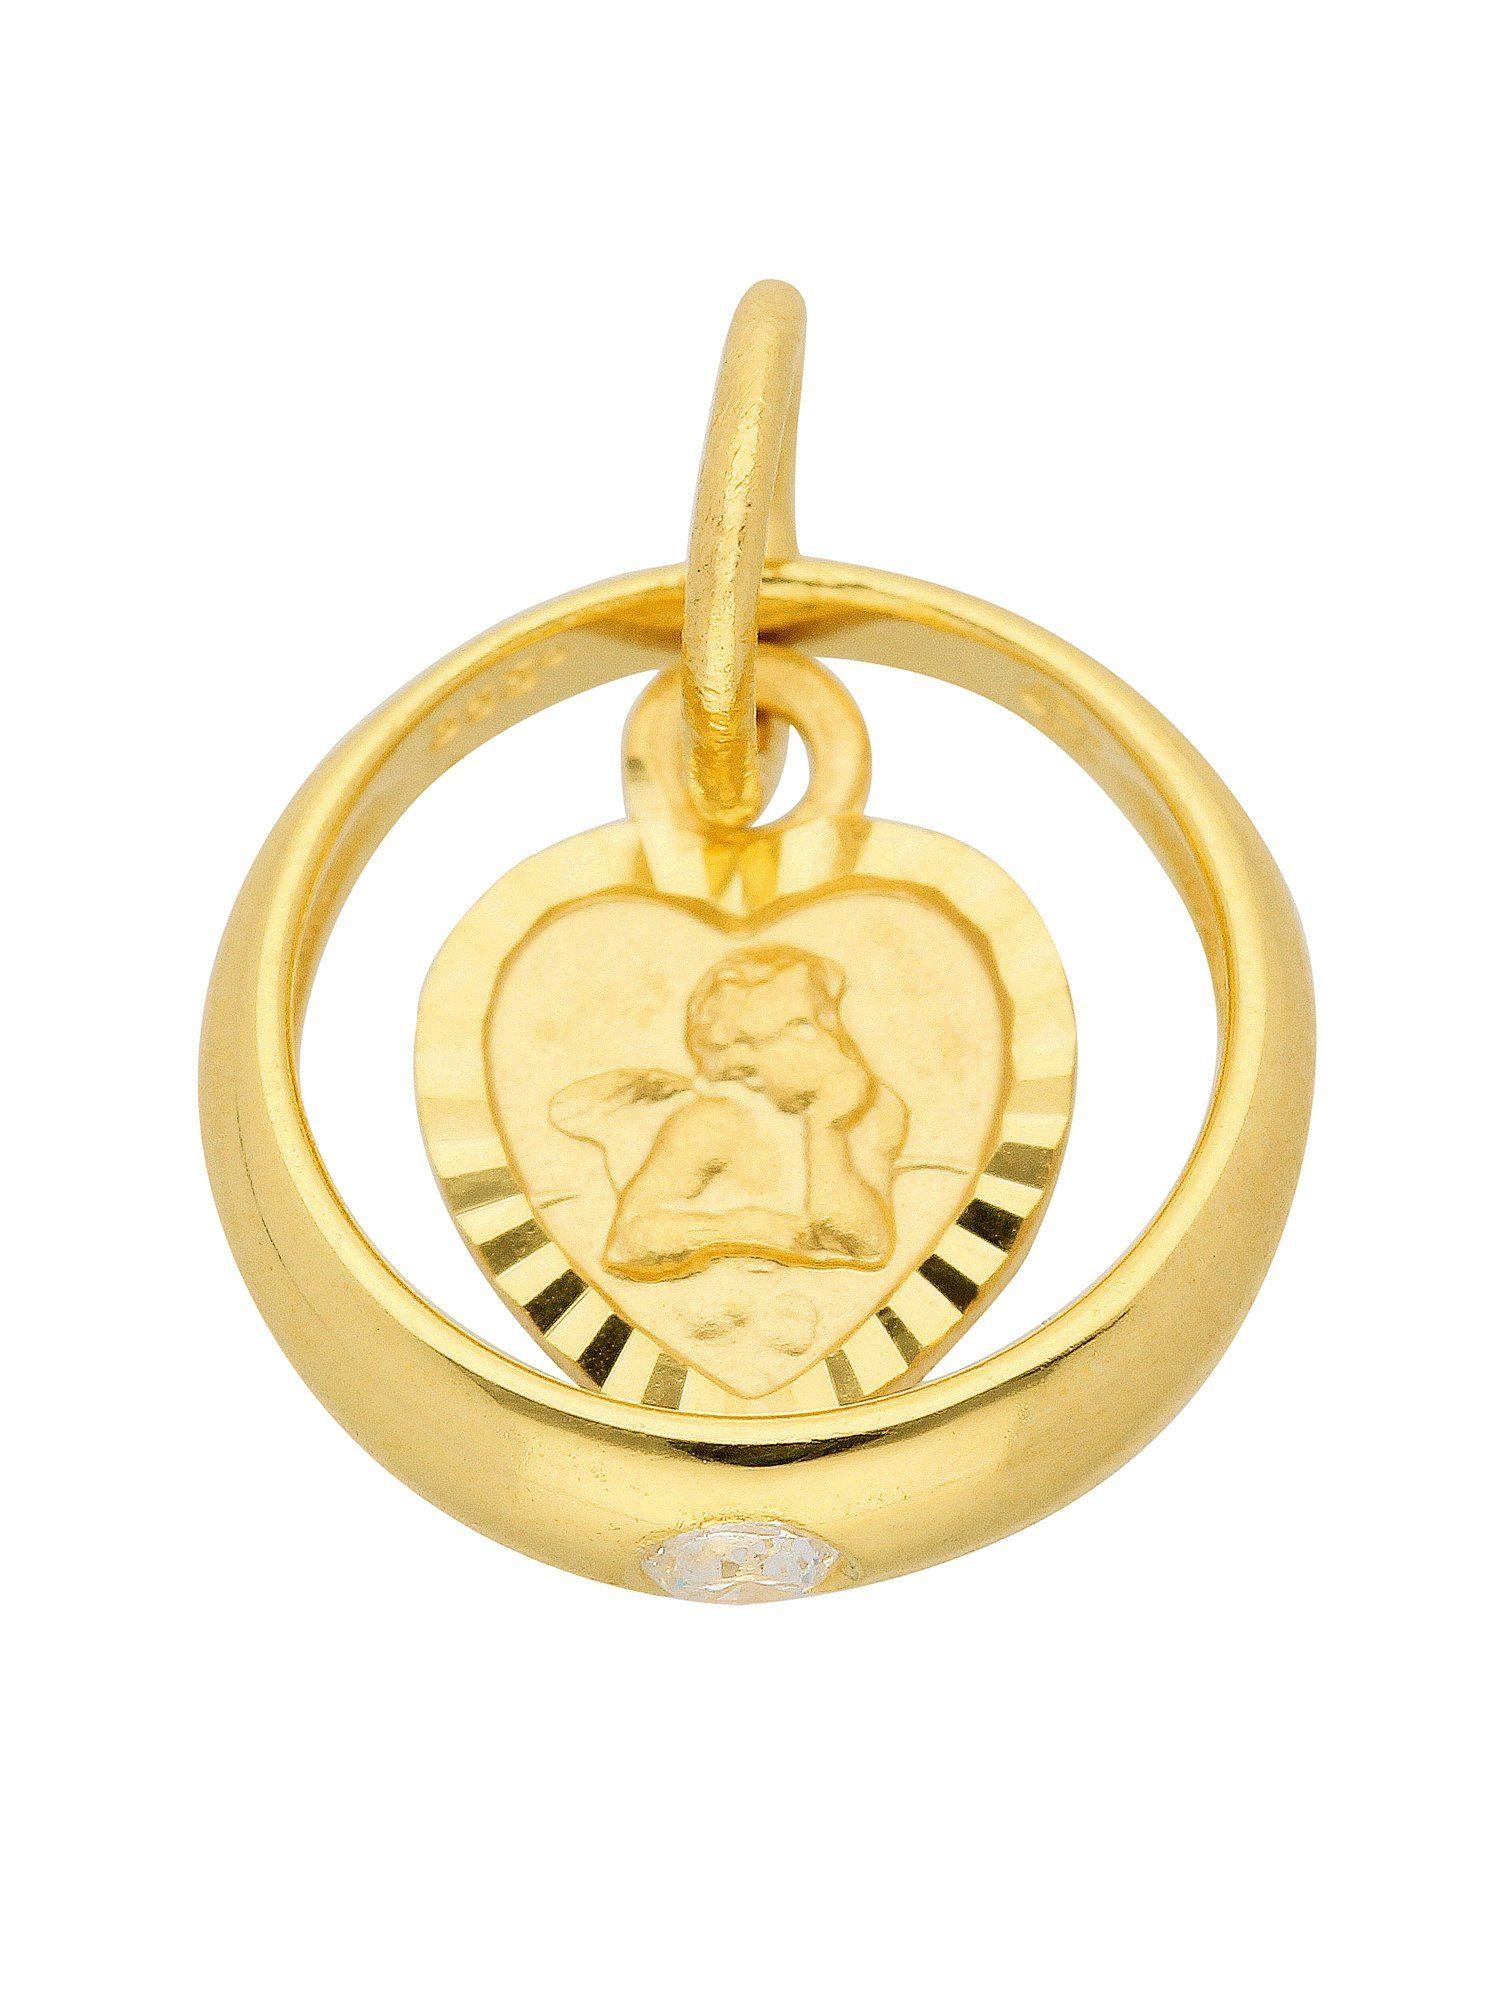 Adelia´s Kettenanhänger »Gold 8 k (333) Motiv - Anhänger« Taufring 8 k 333 Gelbgold mit Zirkonia Ø 1.06 cm